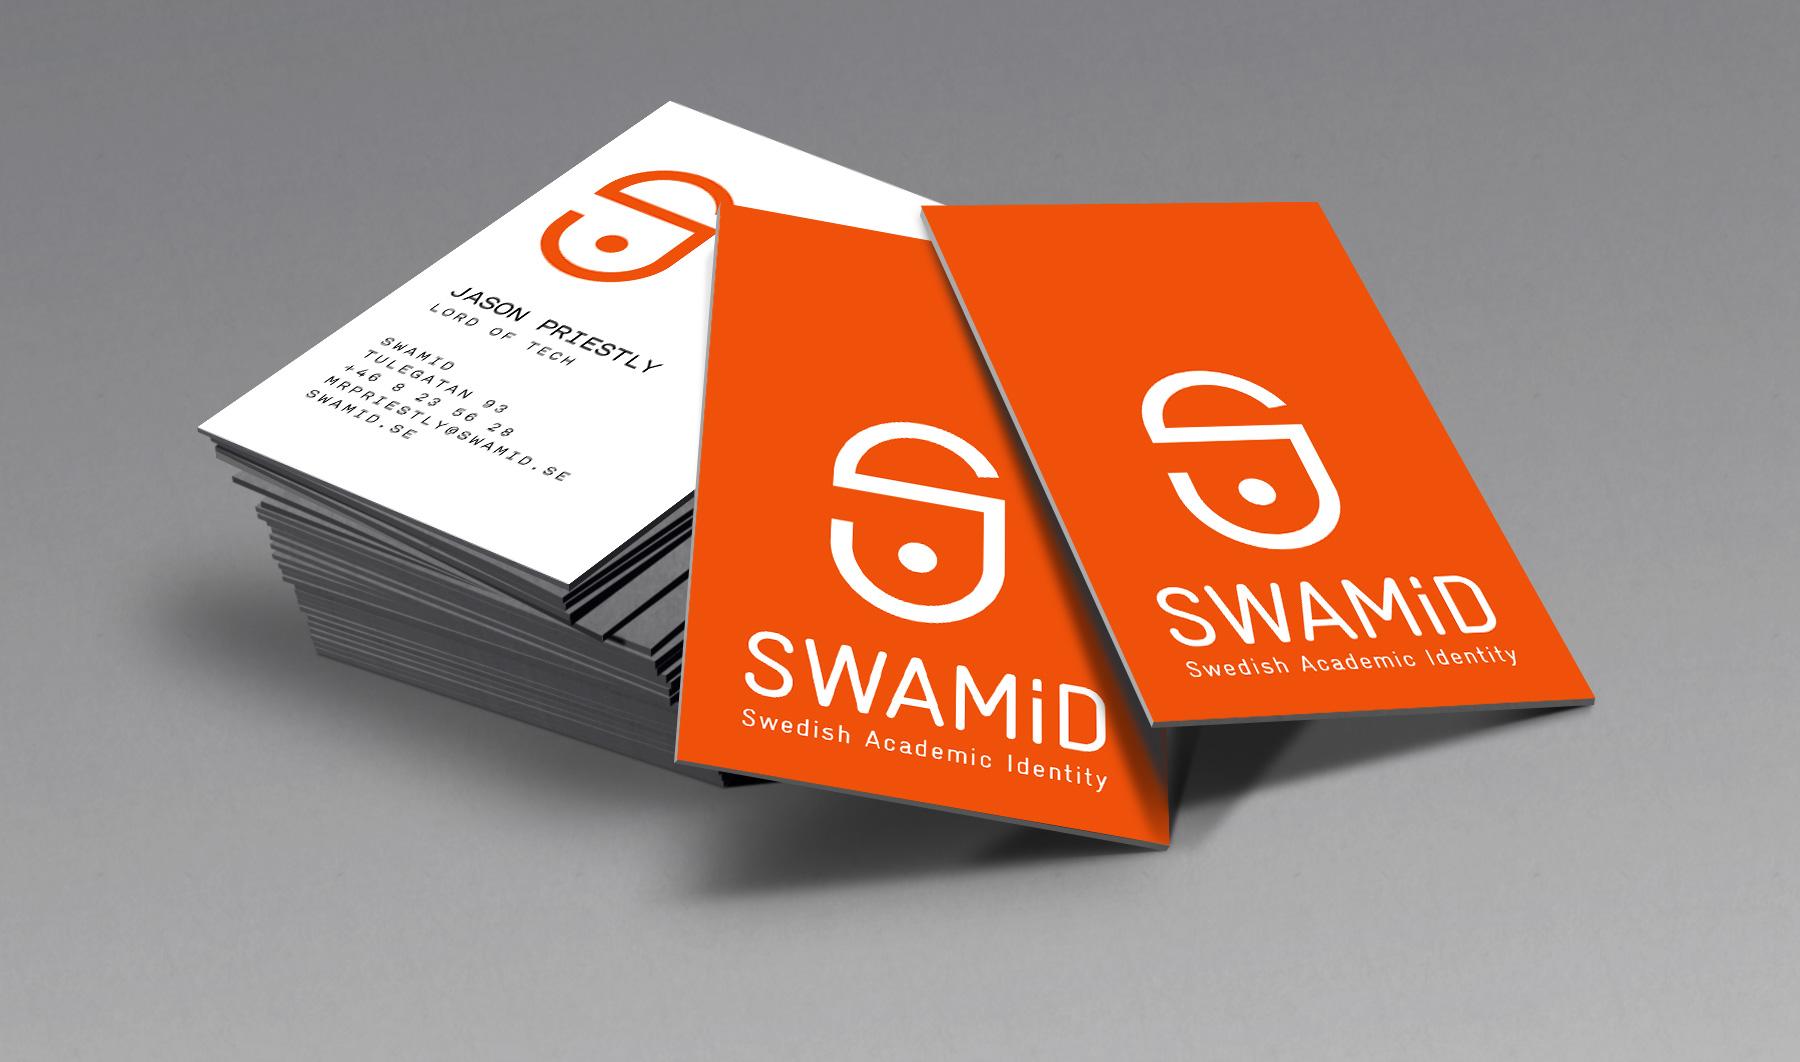 SWAMID Wonderfour webbyrå